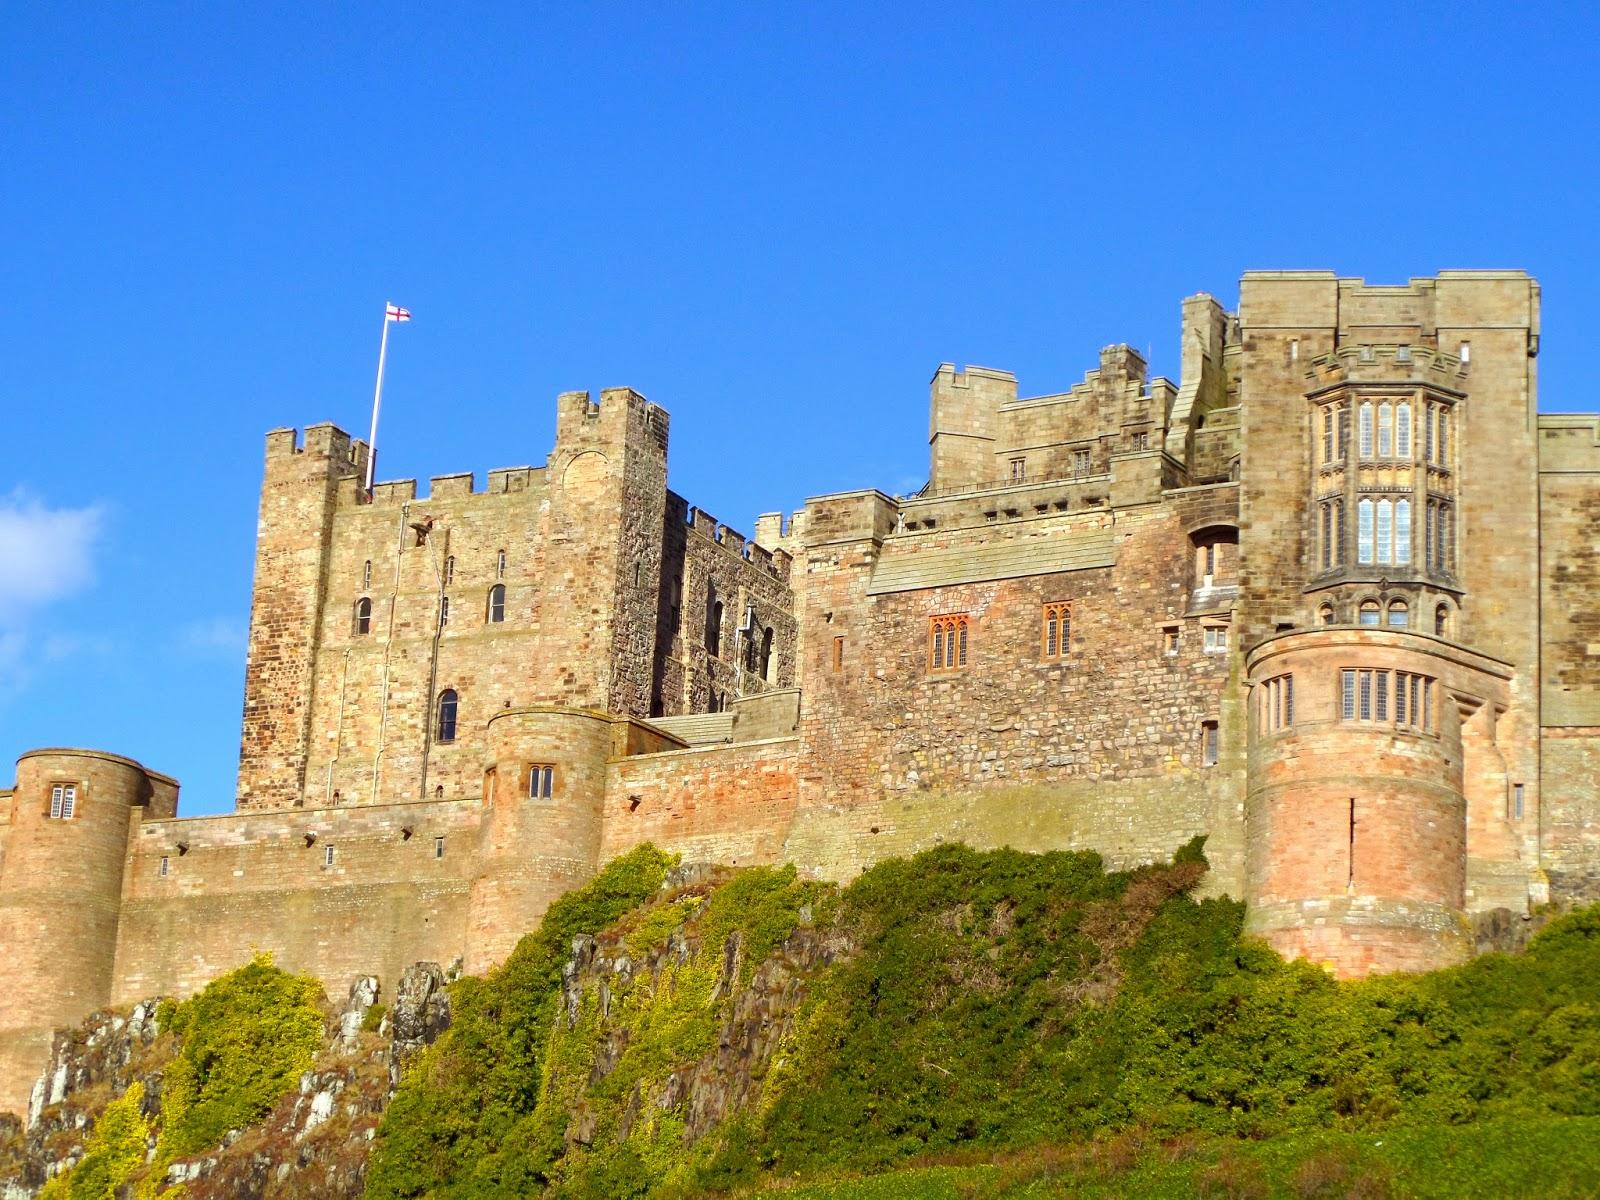 bamburgh castle harry potter - photo #45